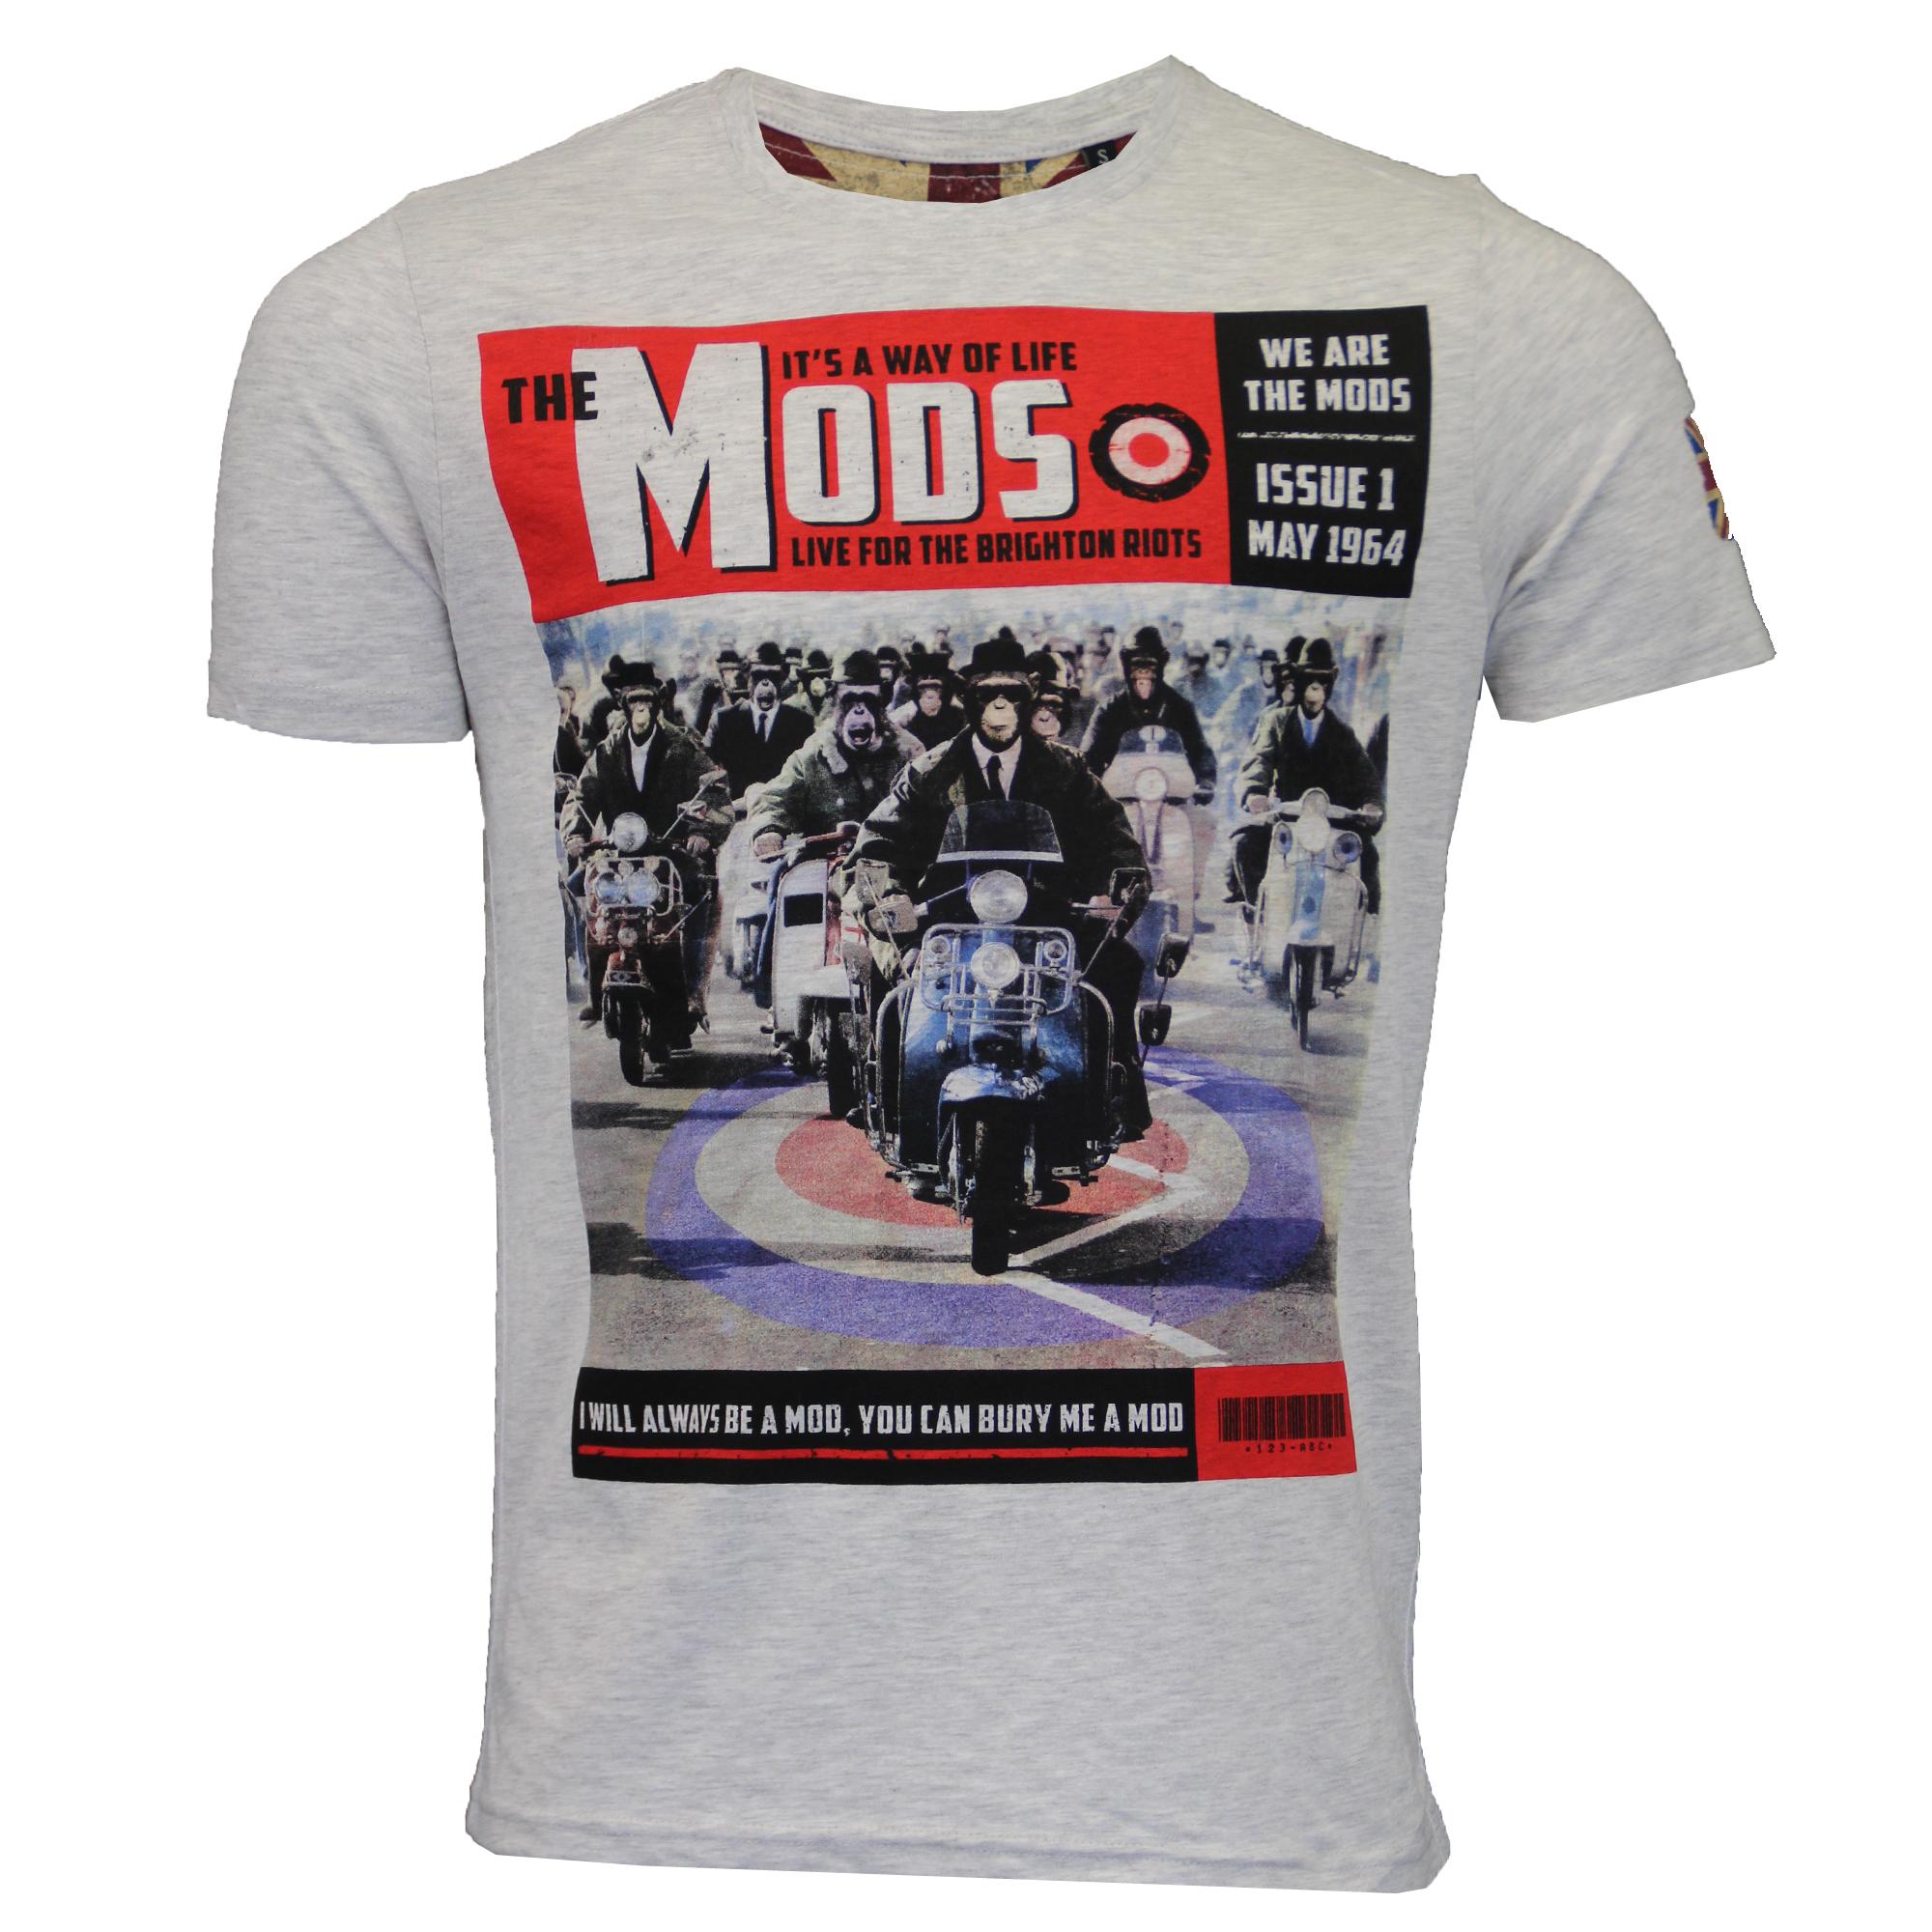 Mens t shirt brave soul 39 entwistle 39 short sleeved mods for Brighton t shirt printing